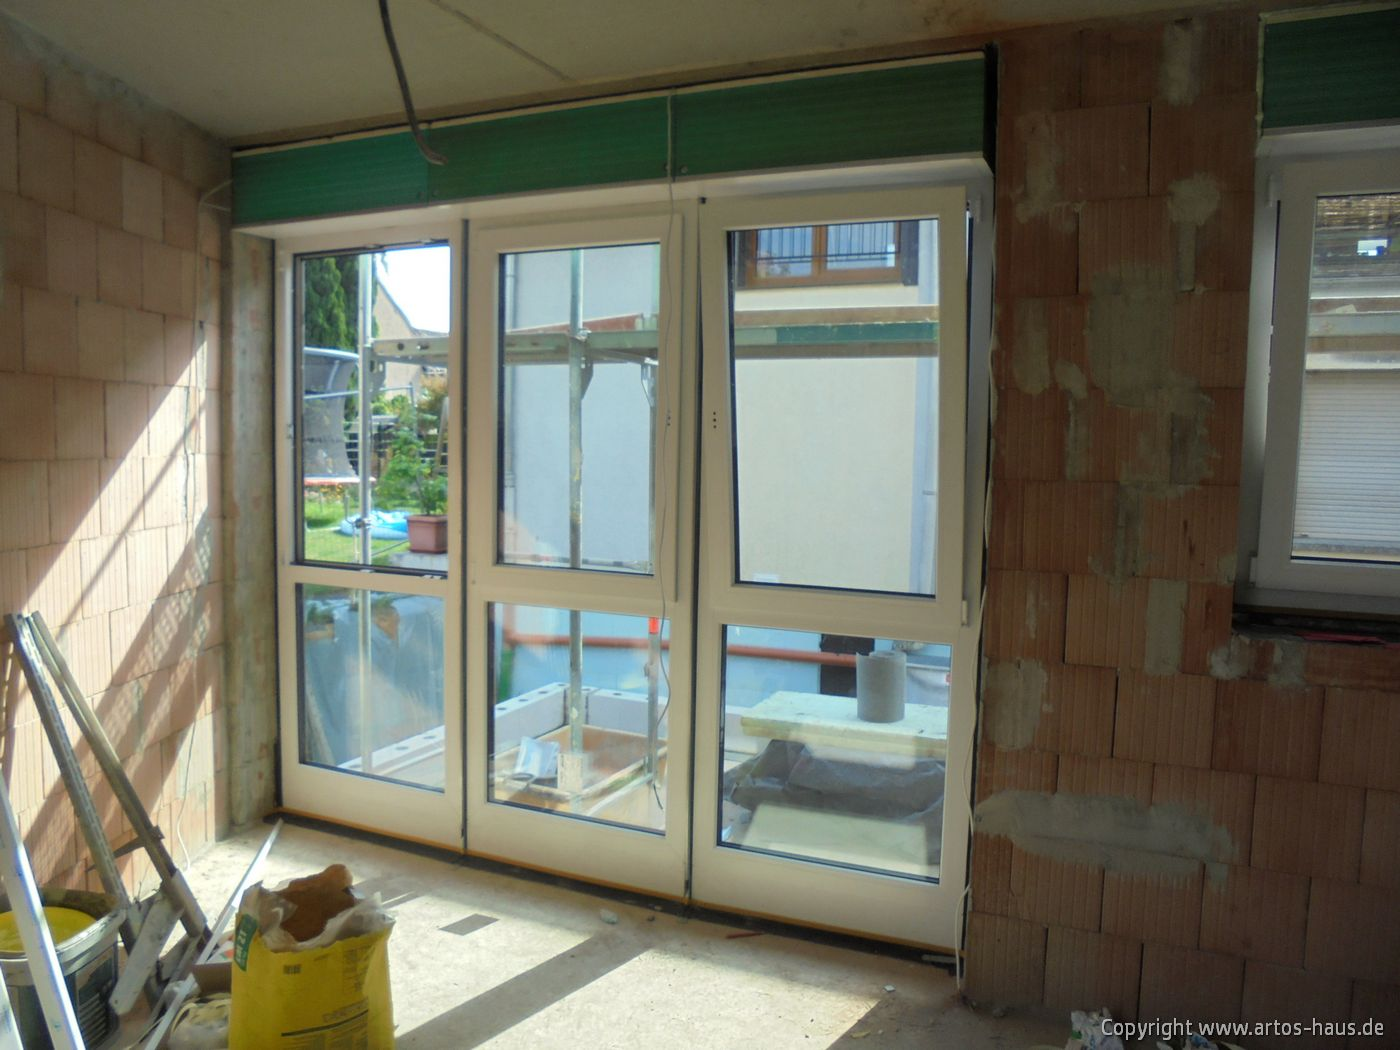 Fenstereinbau MFH Pulheim / ARTOS-HAUS Bild 5